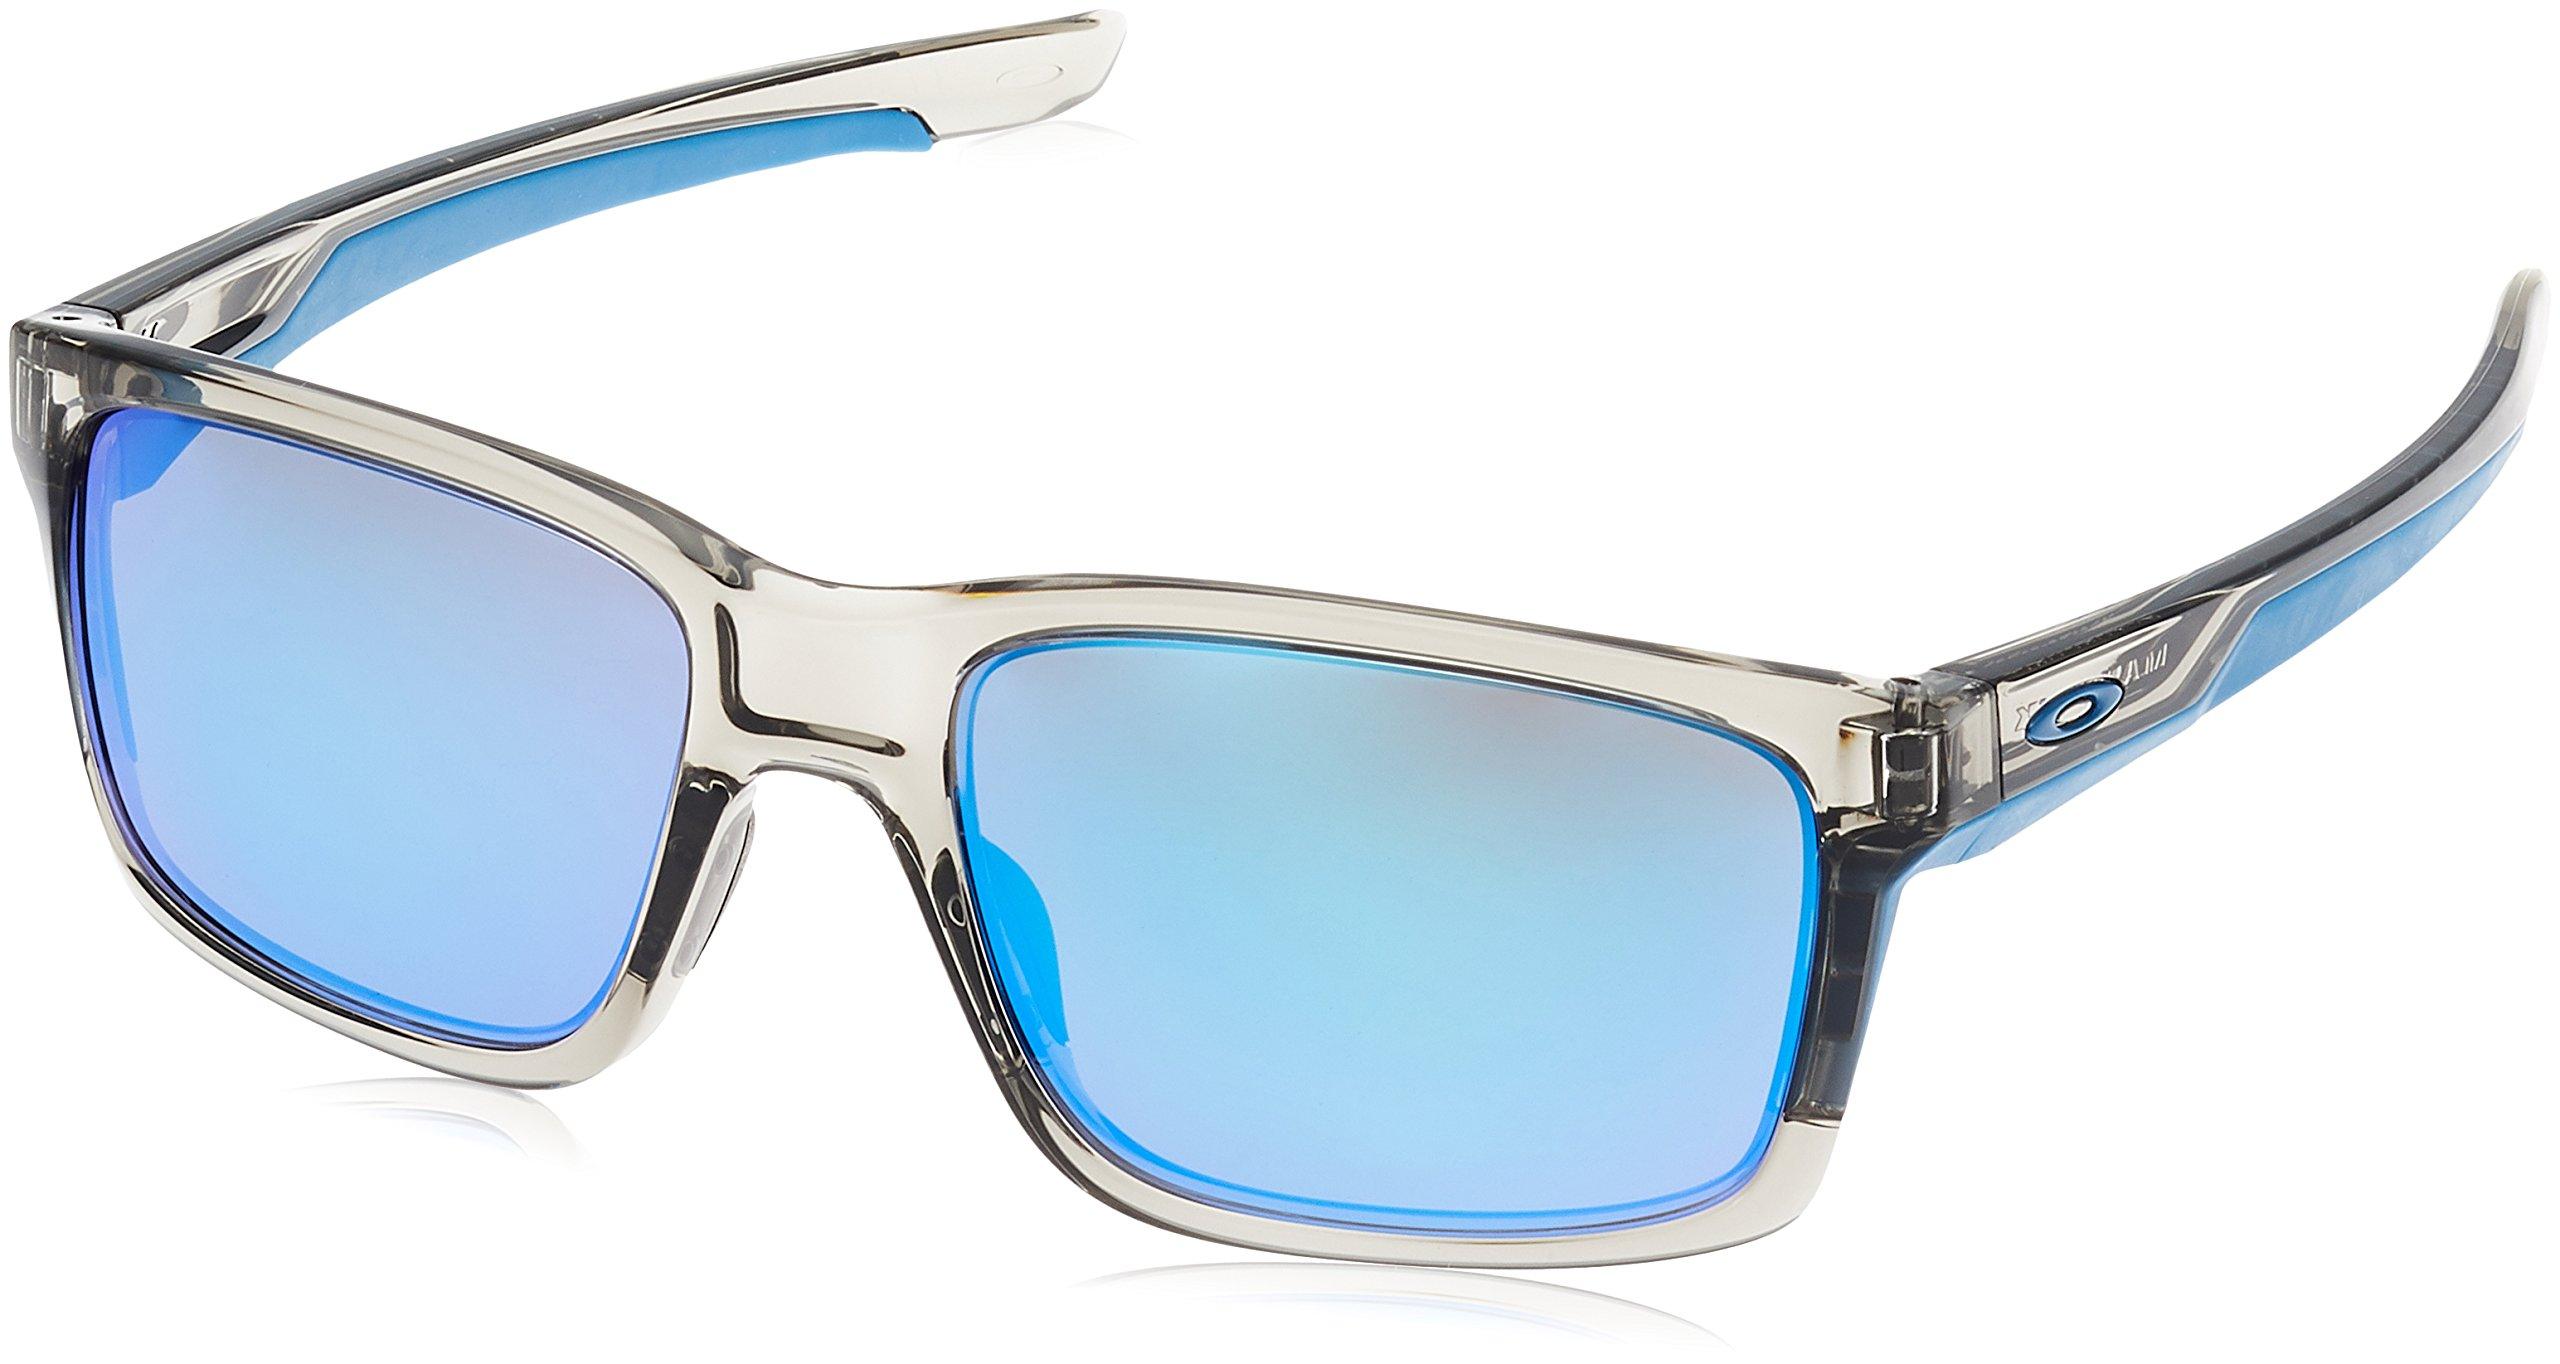 Oakley Men's Mainlink Rectangular Sunglasses, Grey Ink, 57.1 mm